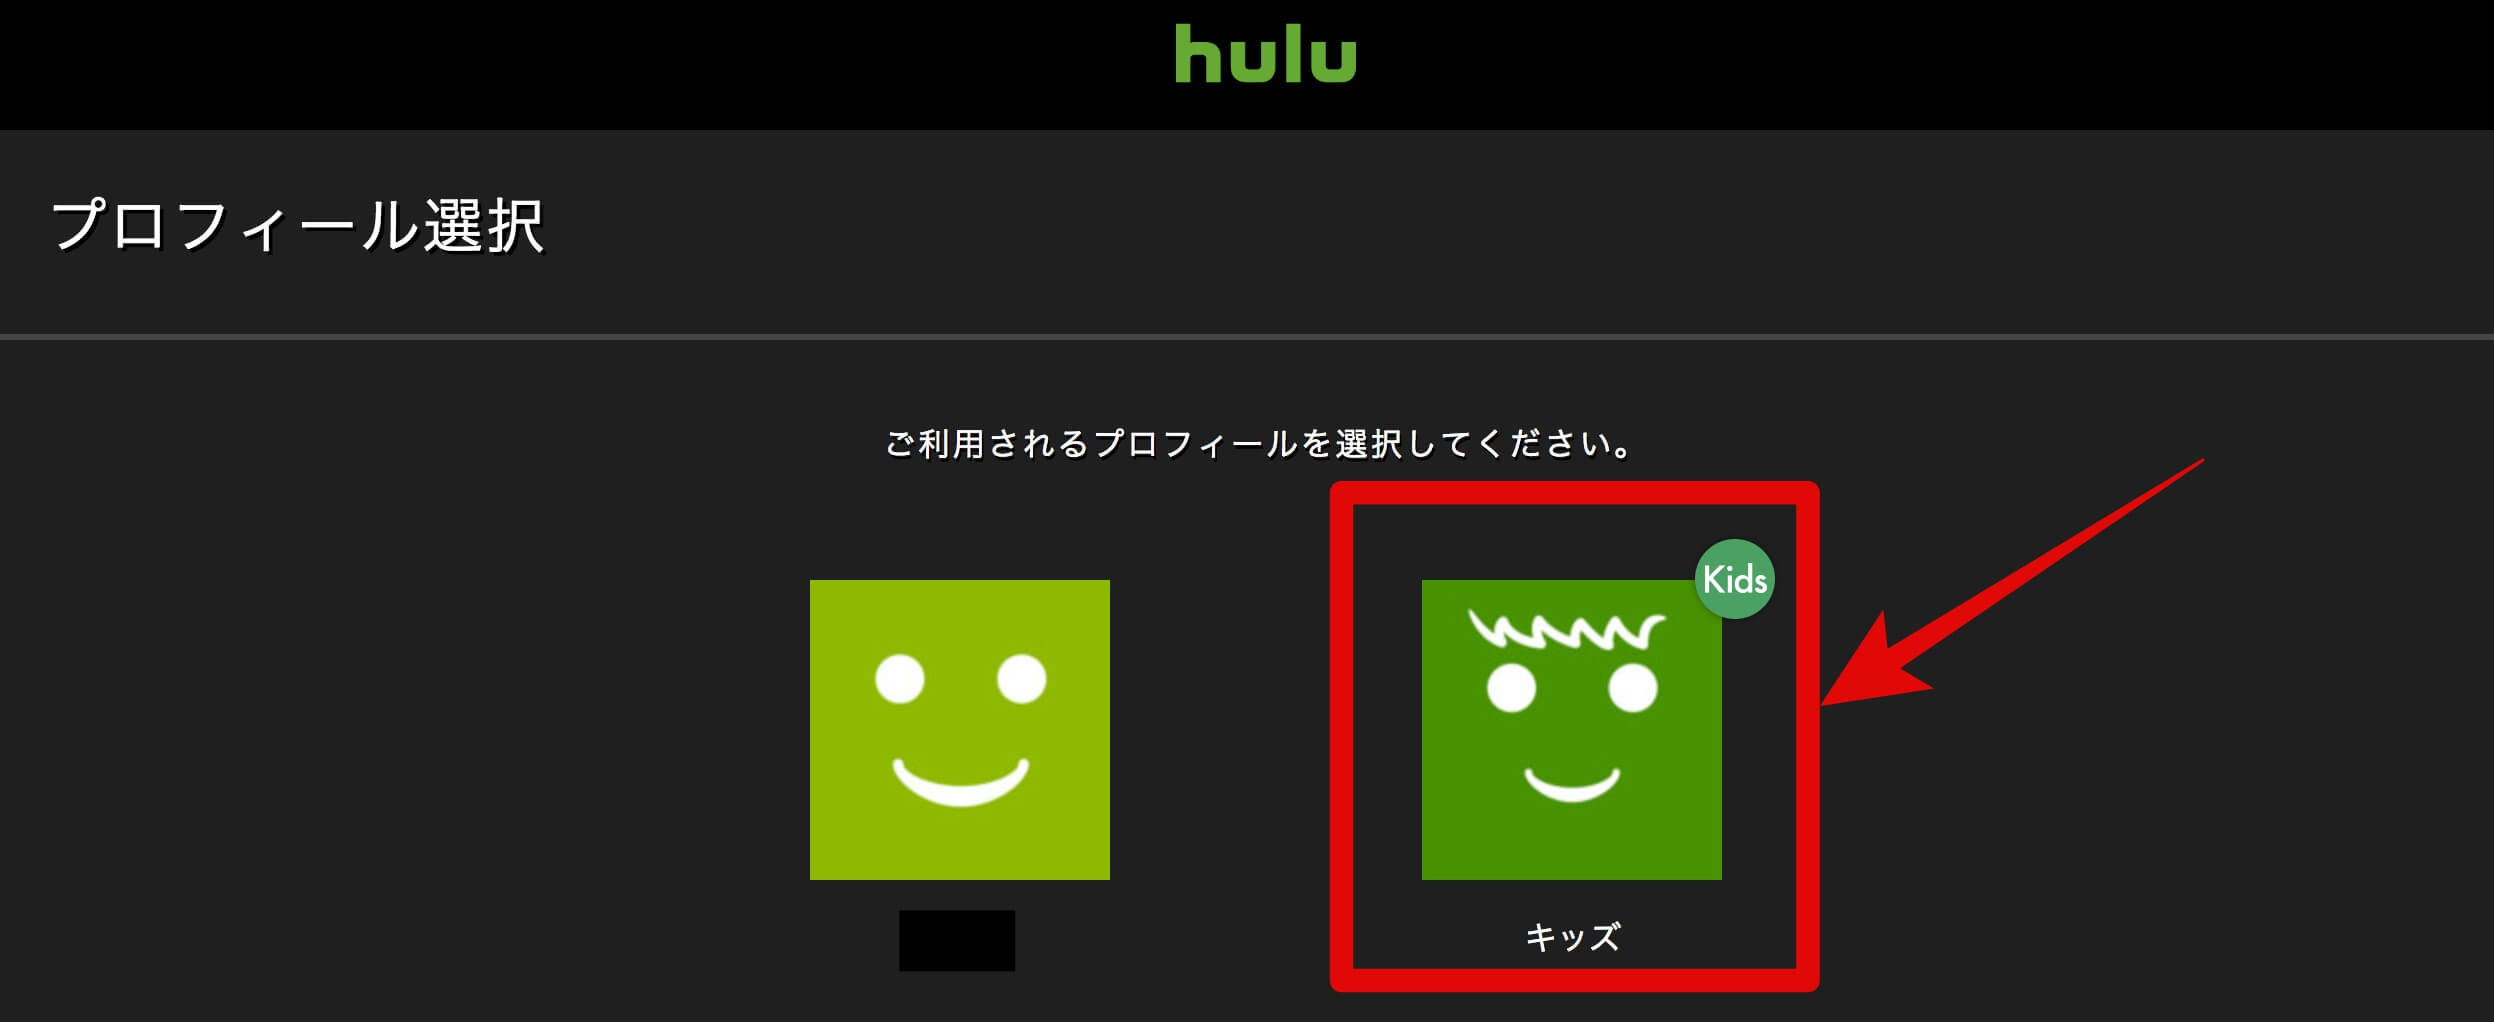 Huluの動画はオフライン再生できる?ダウンロー …